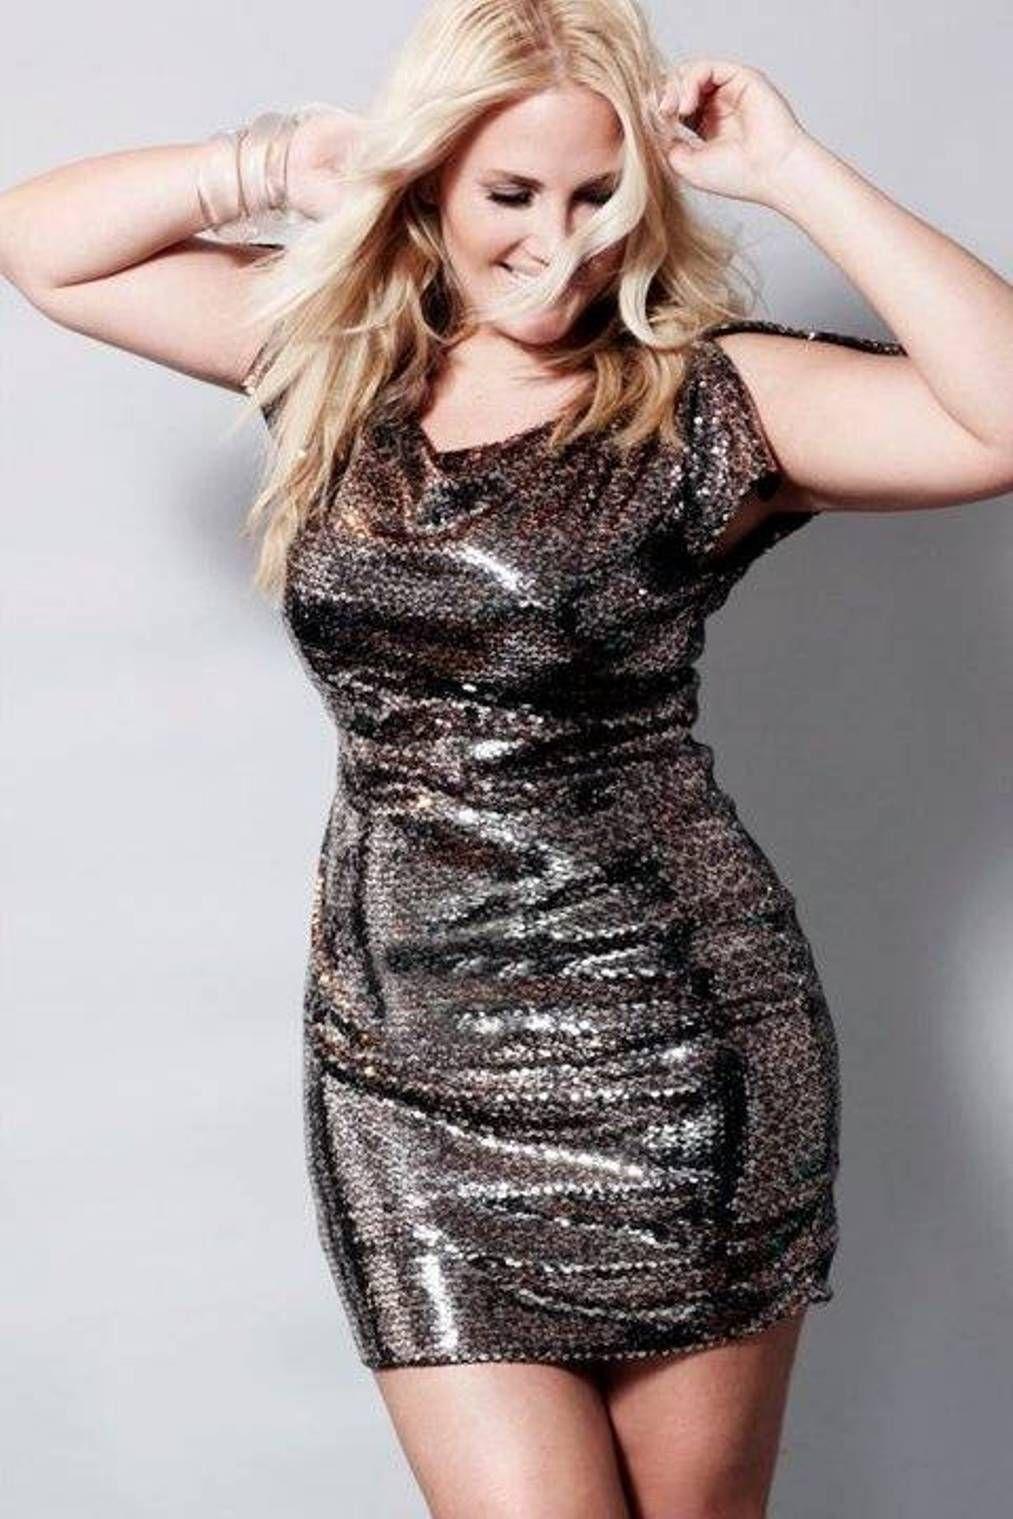 sequin flattering plus size dresses - My Style-Dresses - Pinterest ...